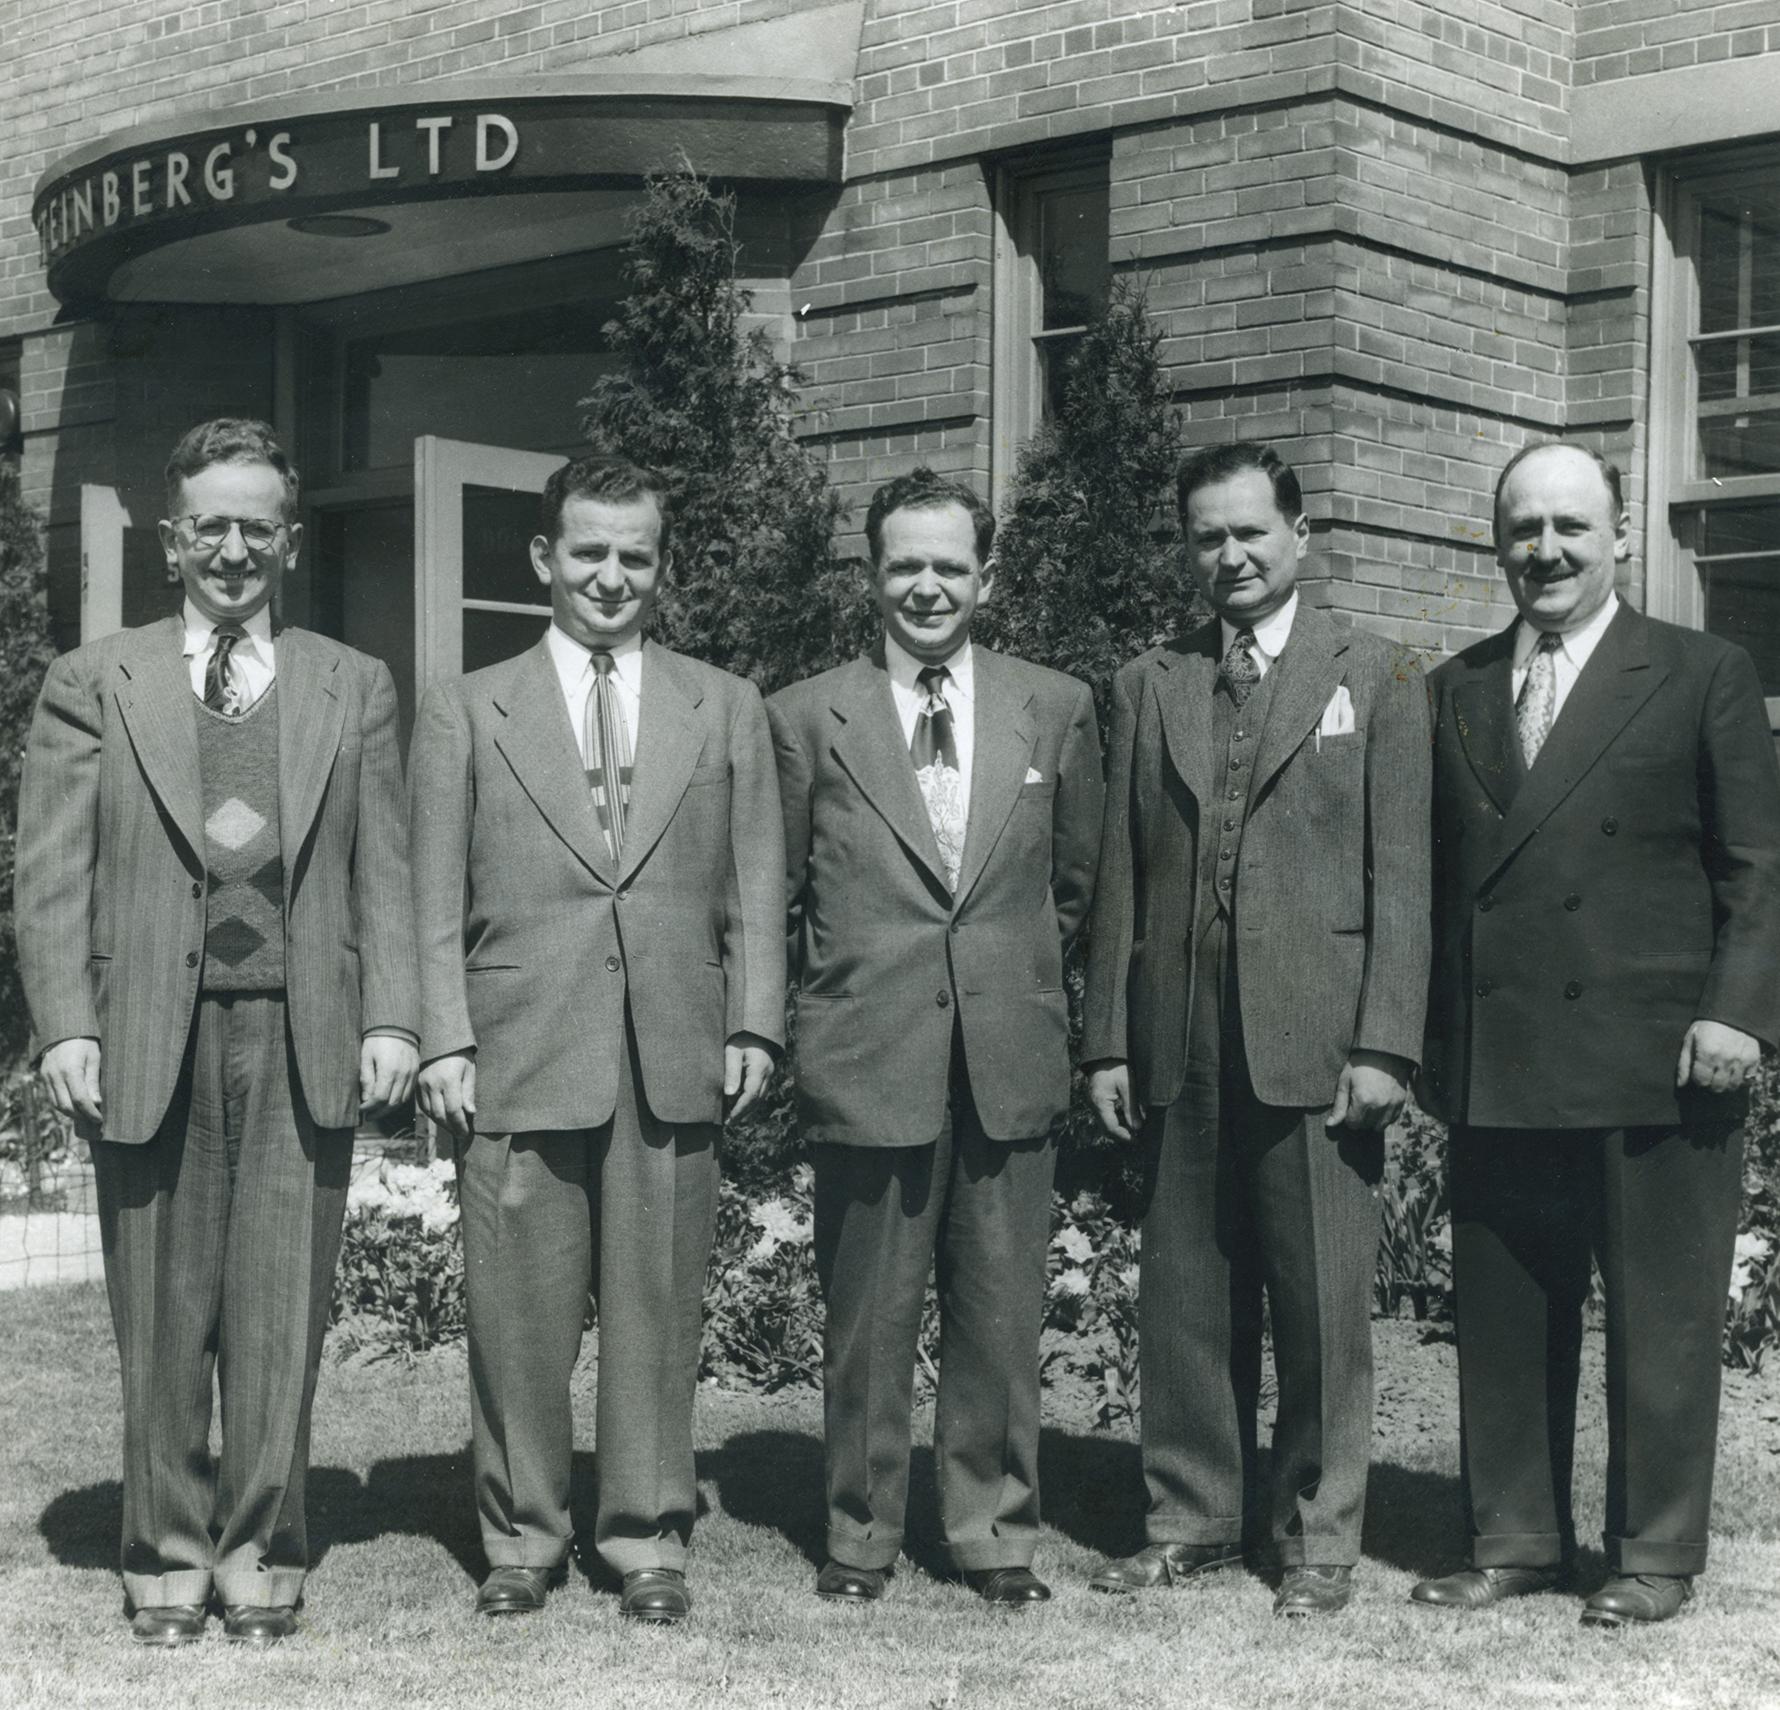 Nathan Steinberg, Jack Steinberg, Sam Steinberg, Max Steinberg et Morris Steinberg réunis devant le siège social de l'entreprise familiale à Montréal.